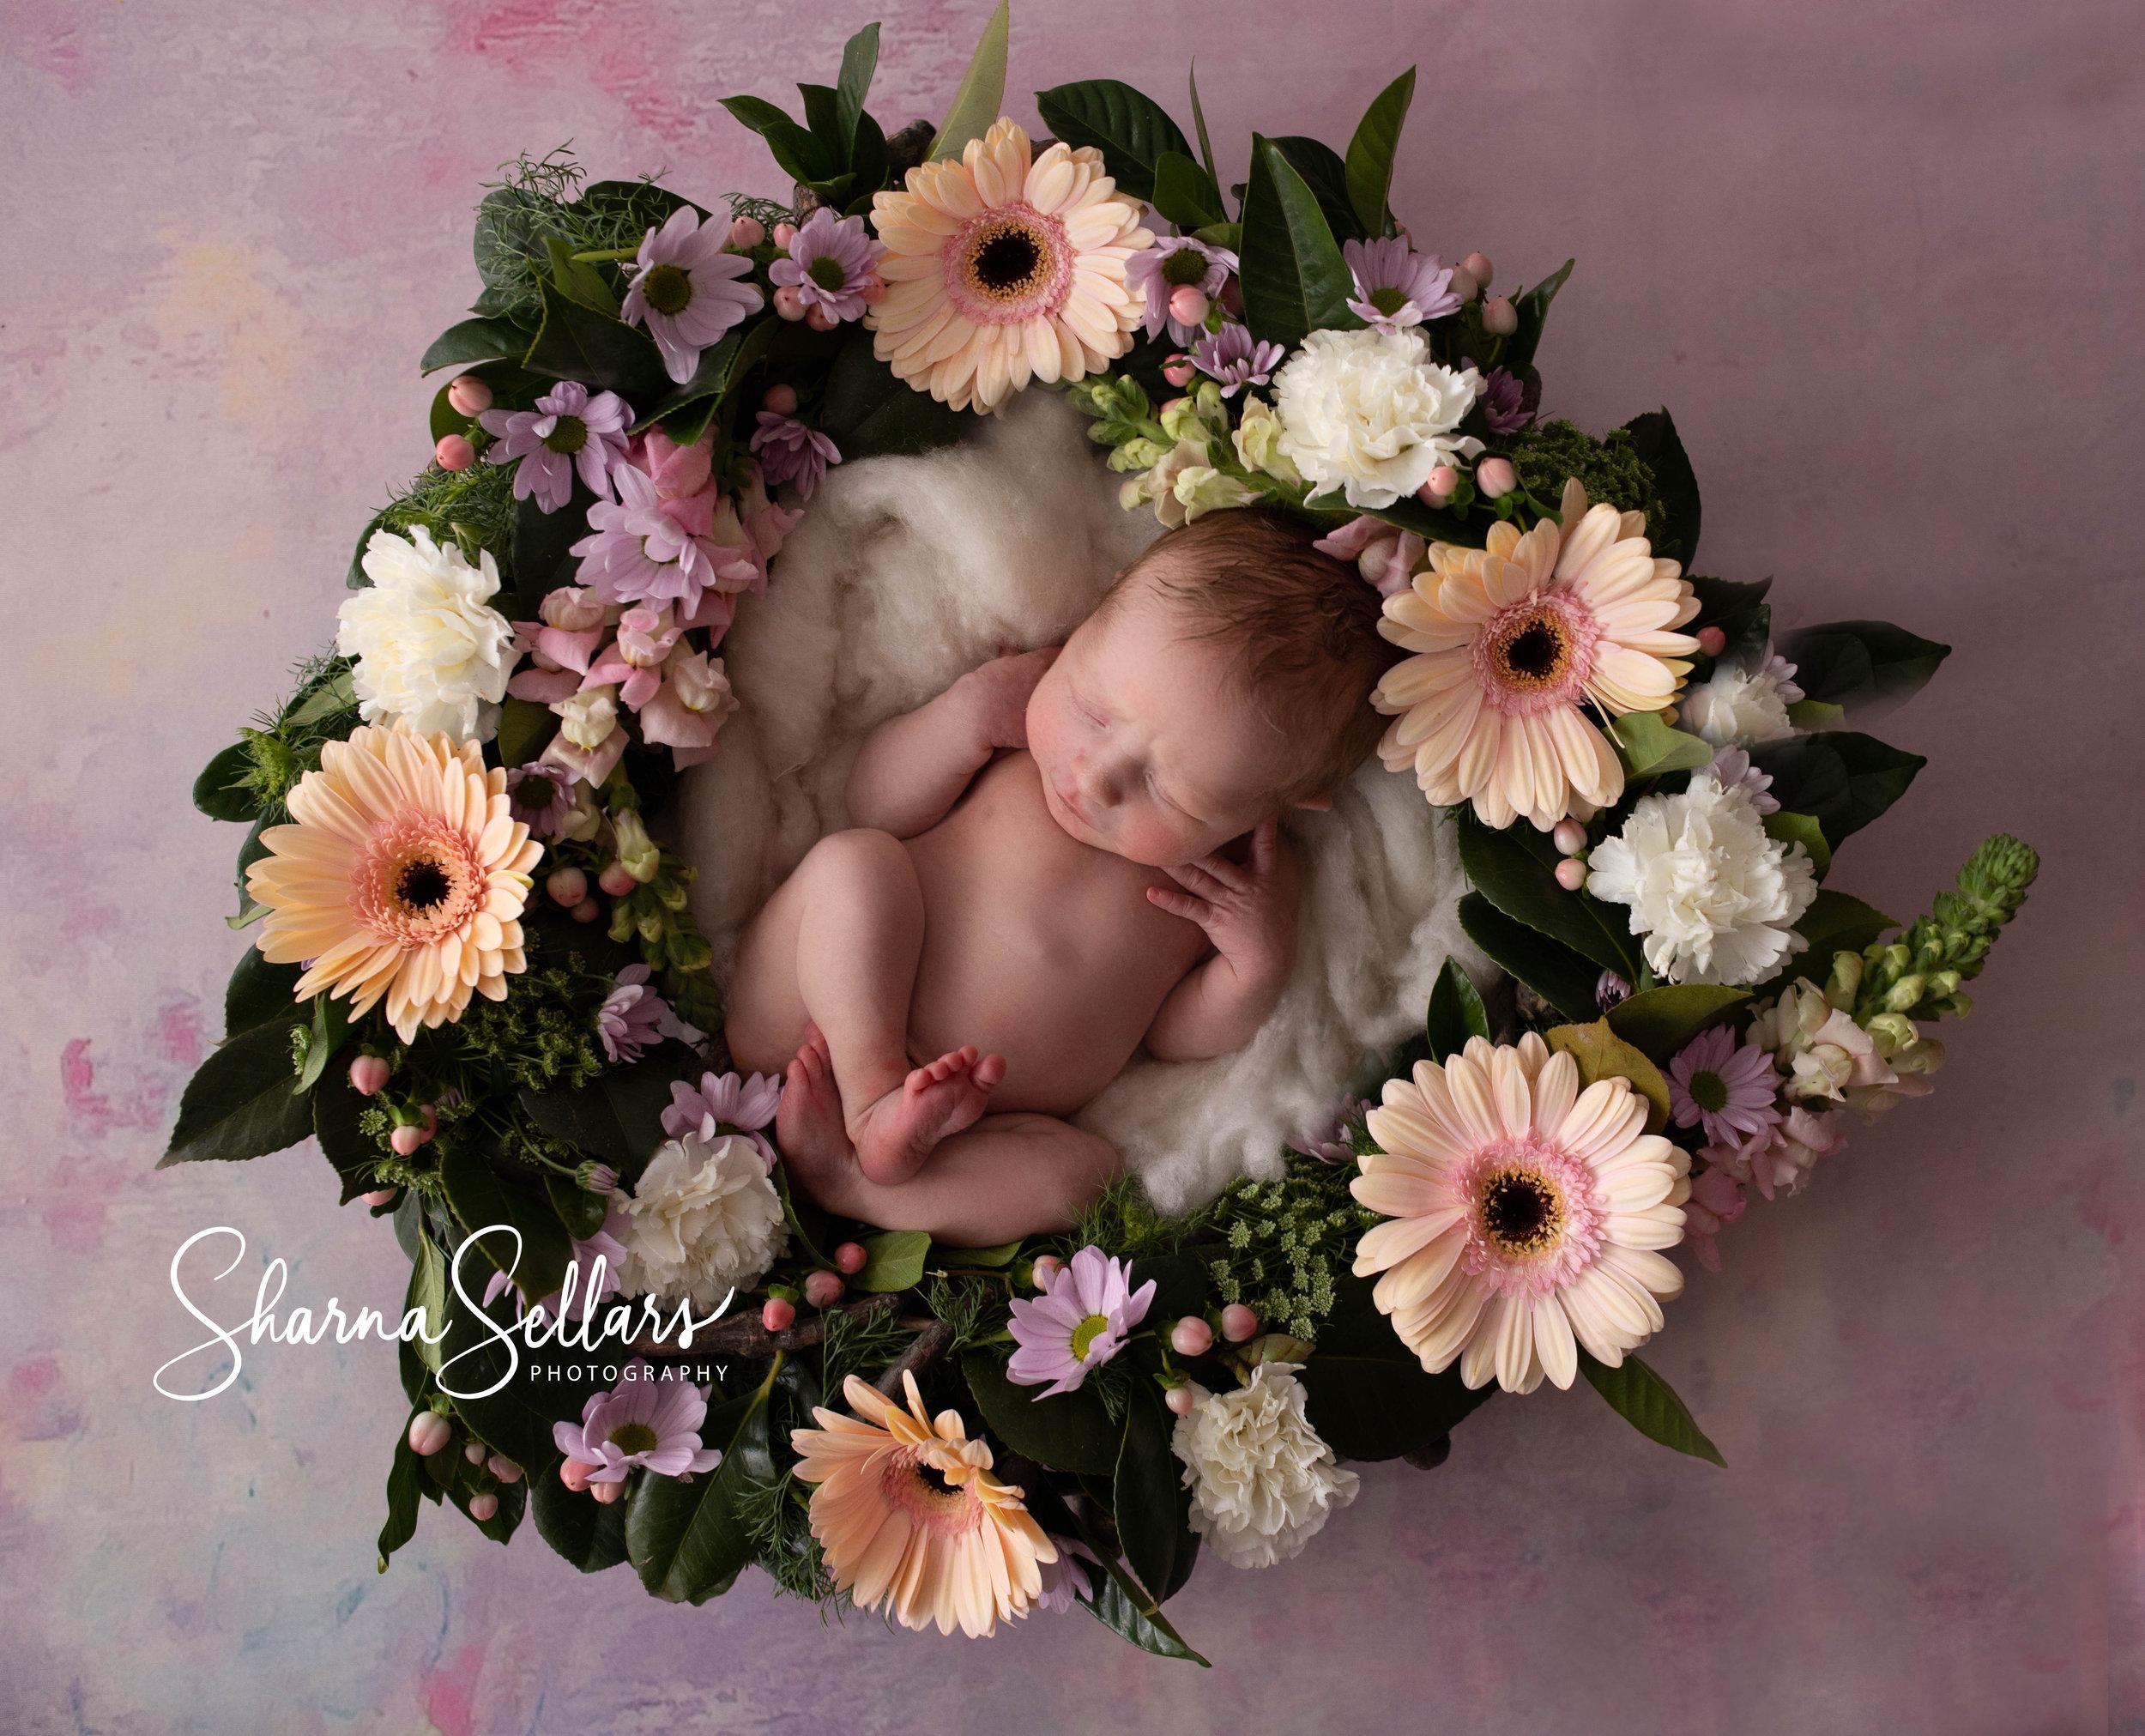 124A3466-Edit2019-28-2019 Aleeya newborn.jpg logo.jpg